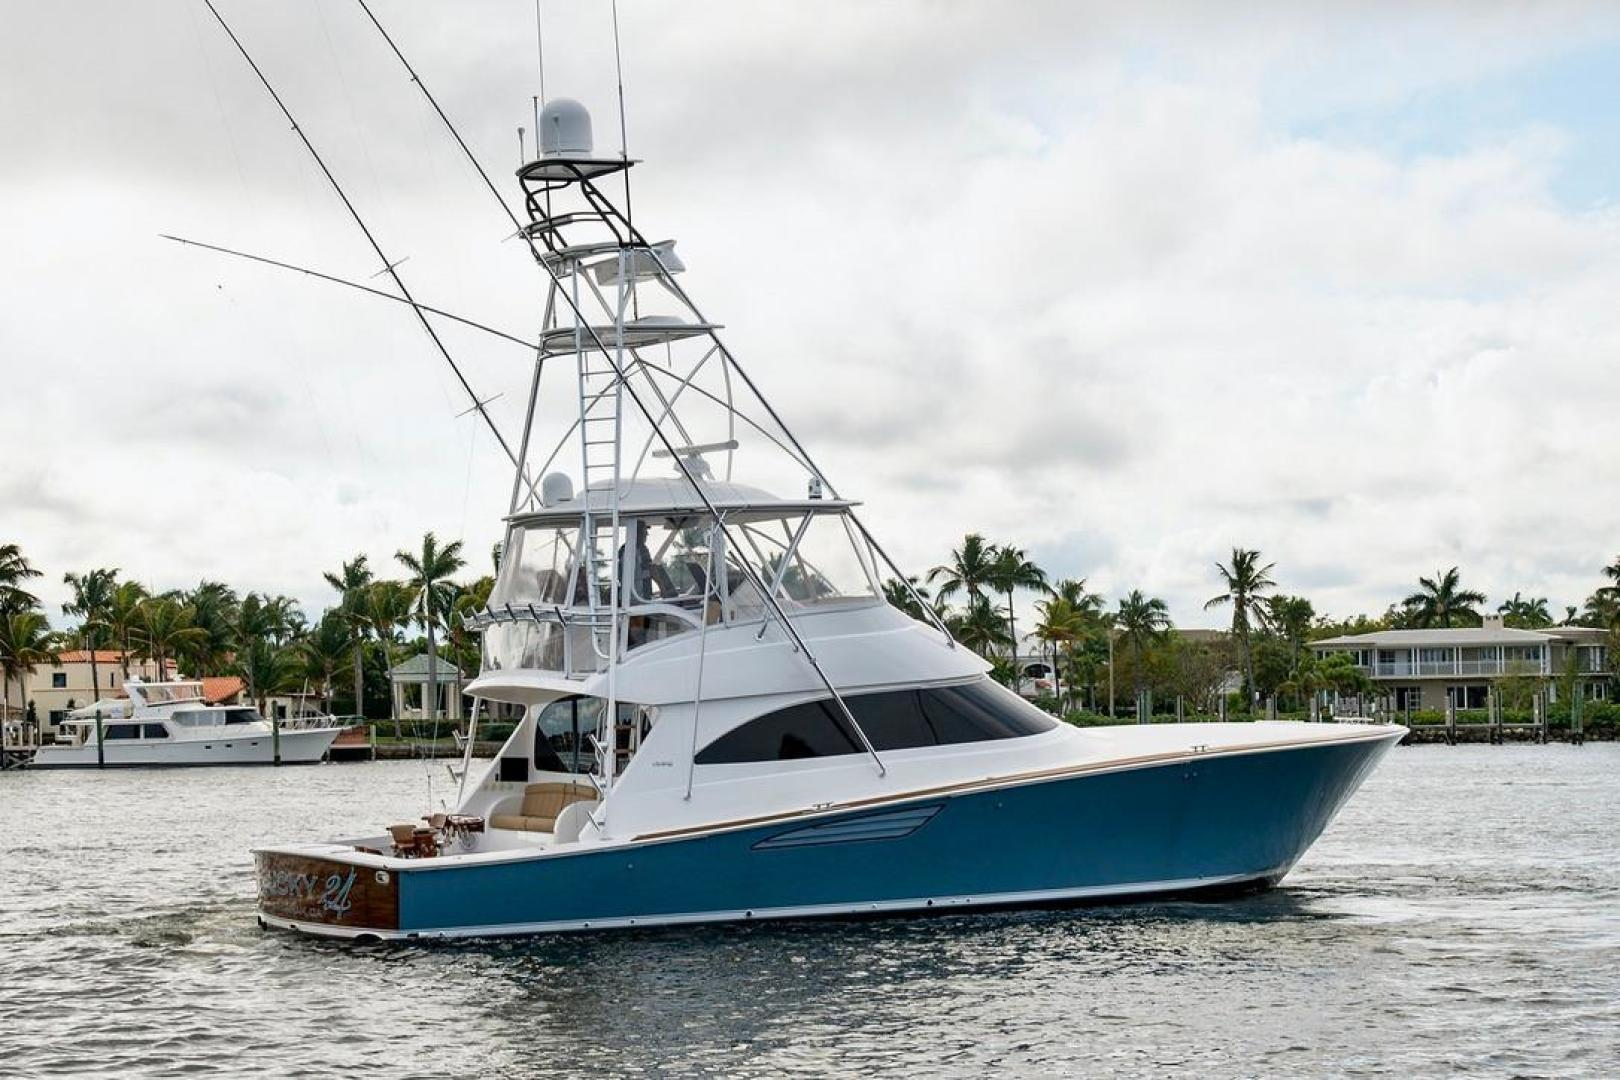 Viking-Convertible 2015-Lucky 24 Too Savannah-Georgia-United States-1538628 | Thumbnail